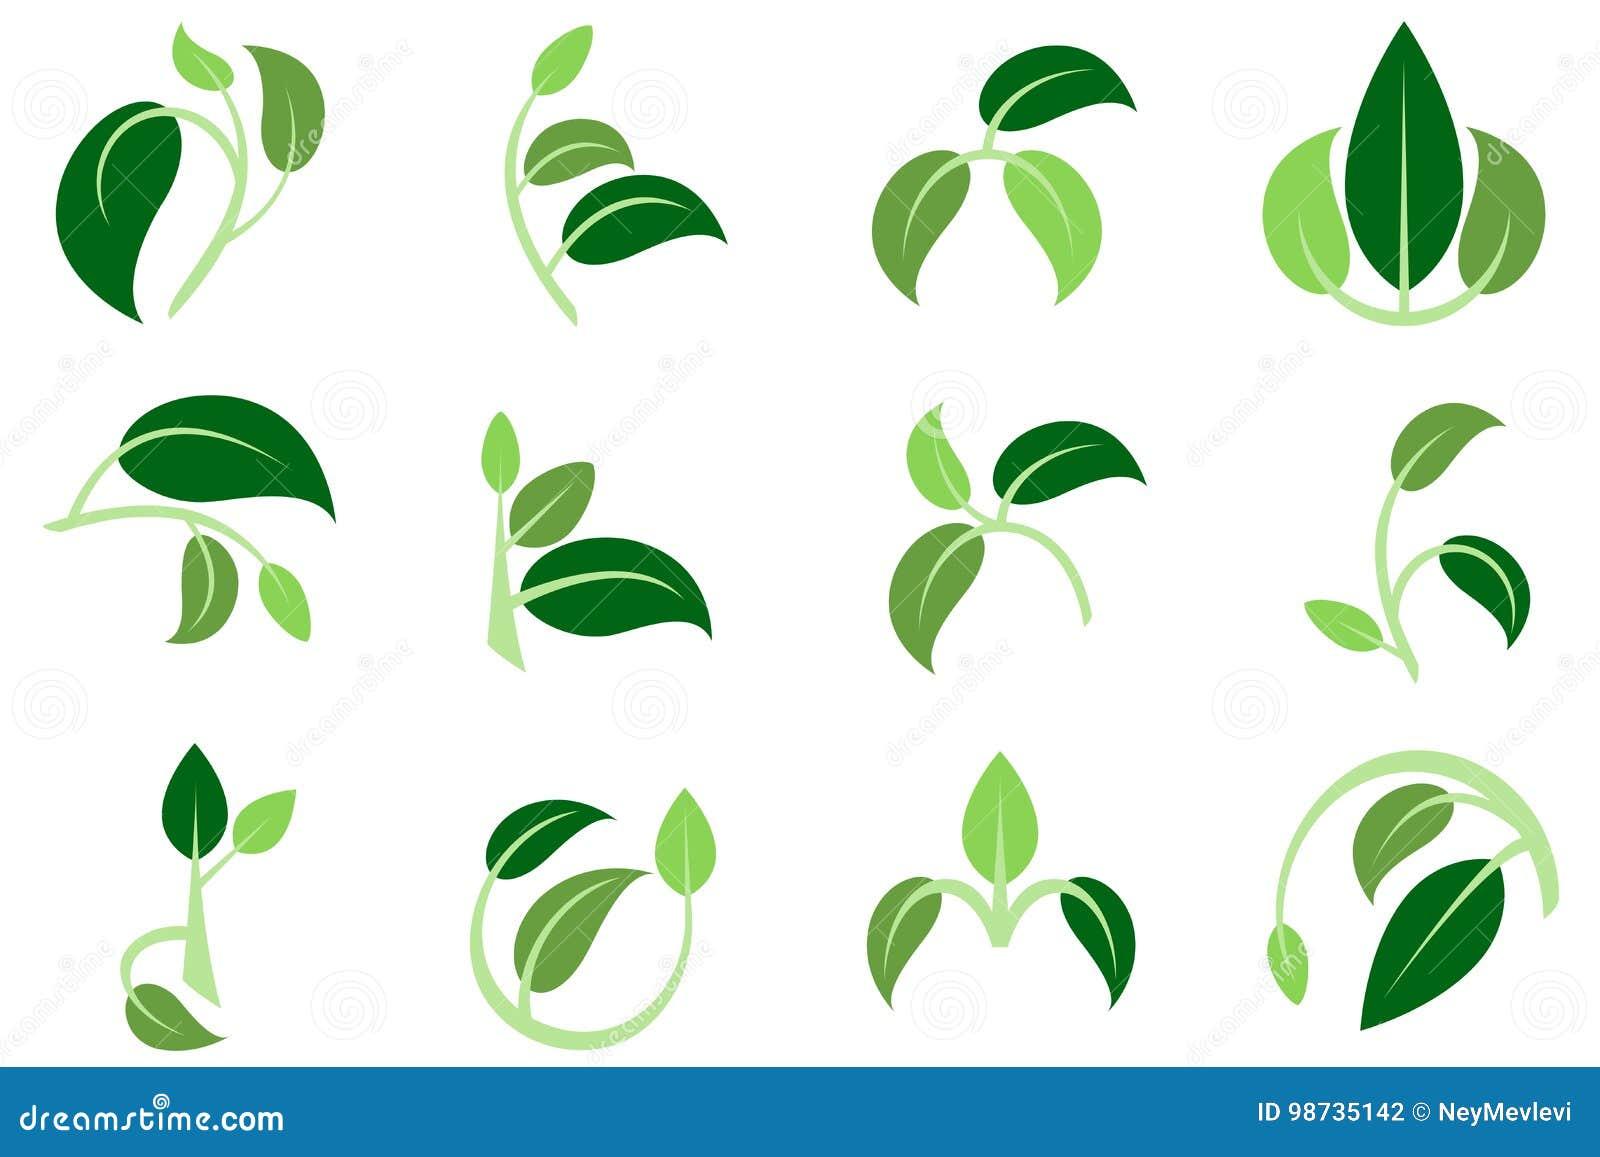 3 leaves 3 colors 3 twigs symbol logo